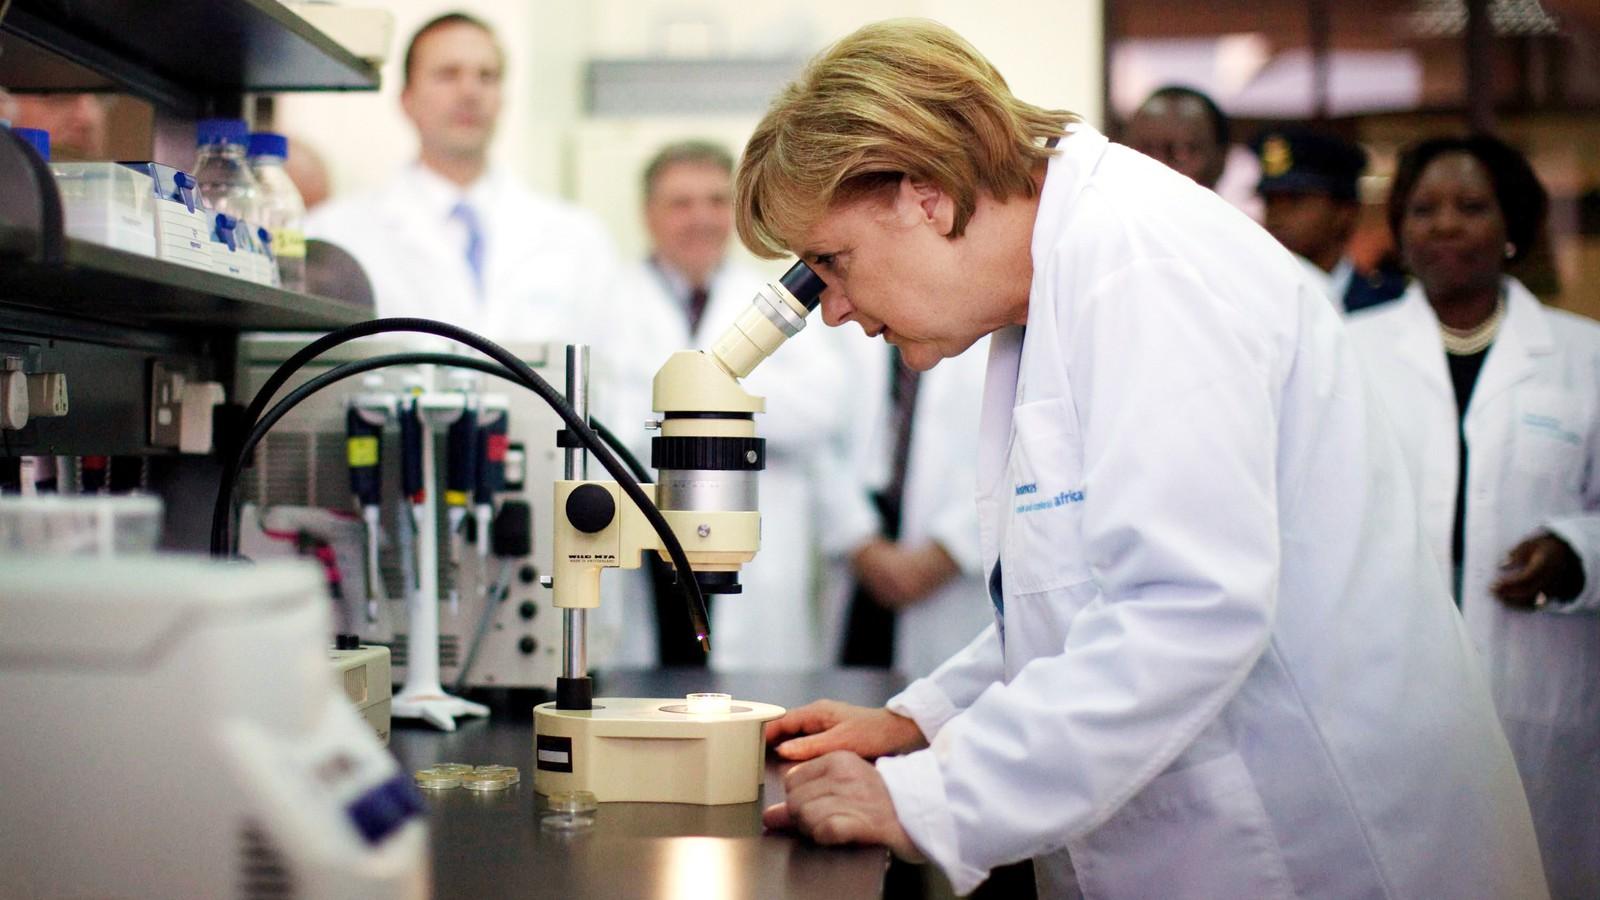 Angela Merkel's Scientific Background Could Save Germany - The Atlantic